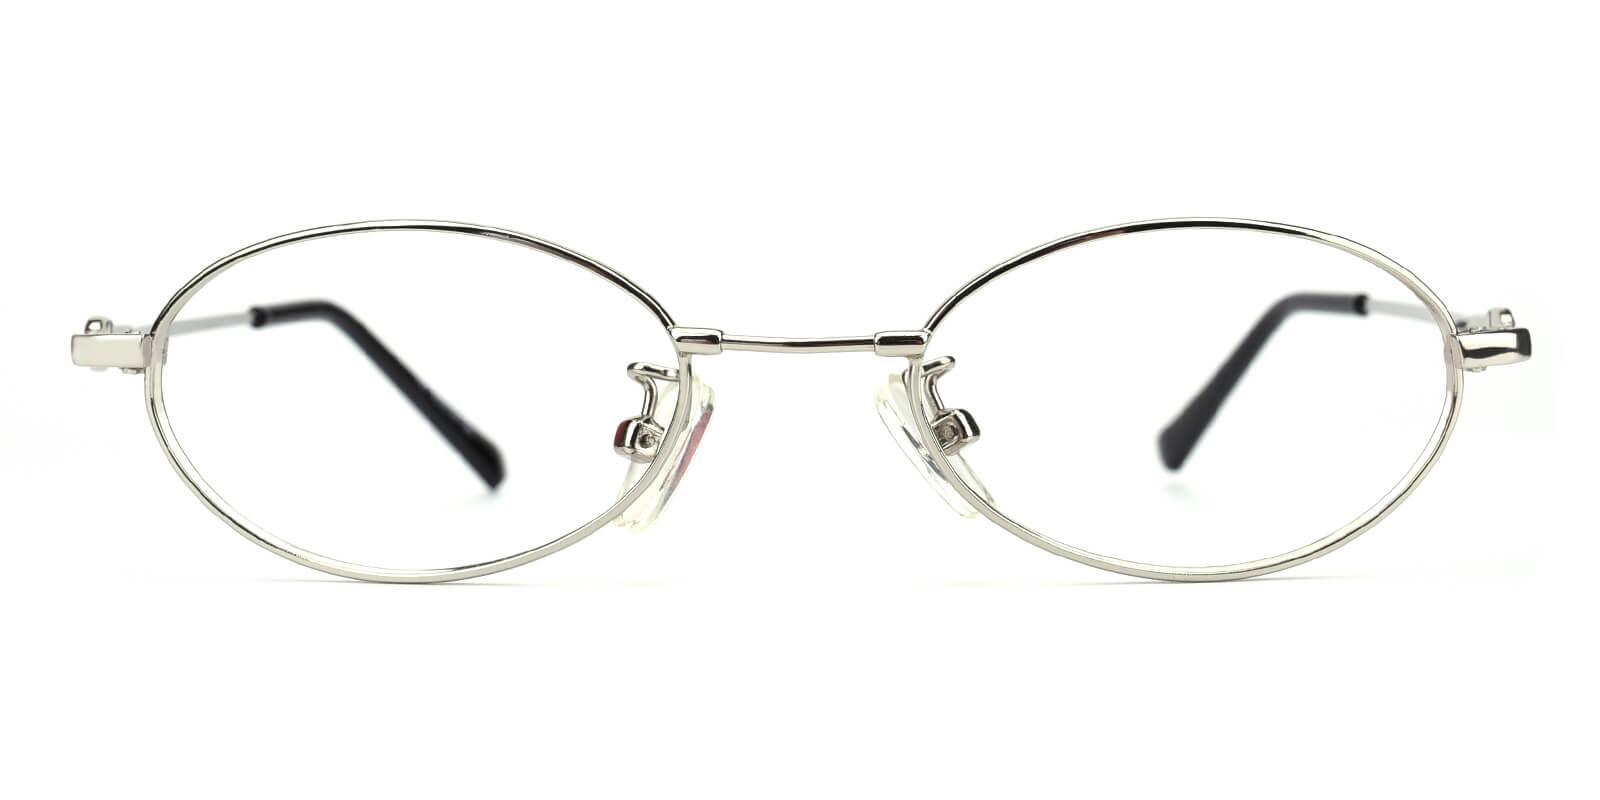 Mikestar-Silver-Oval-Titanium-Eyeglasses-additional2